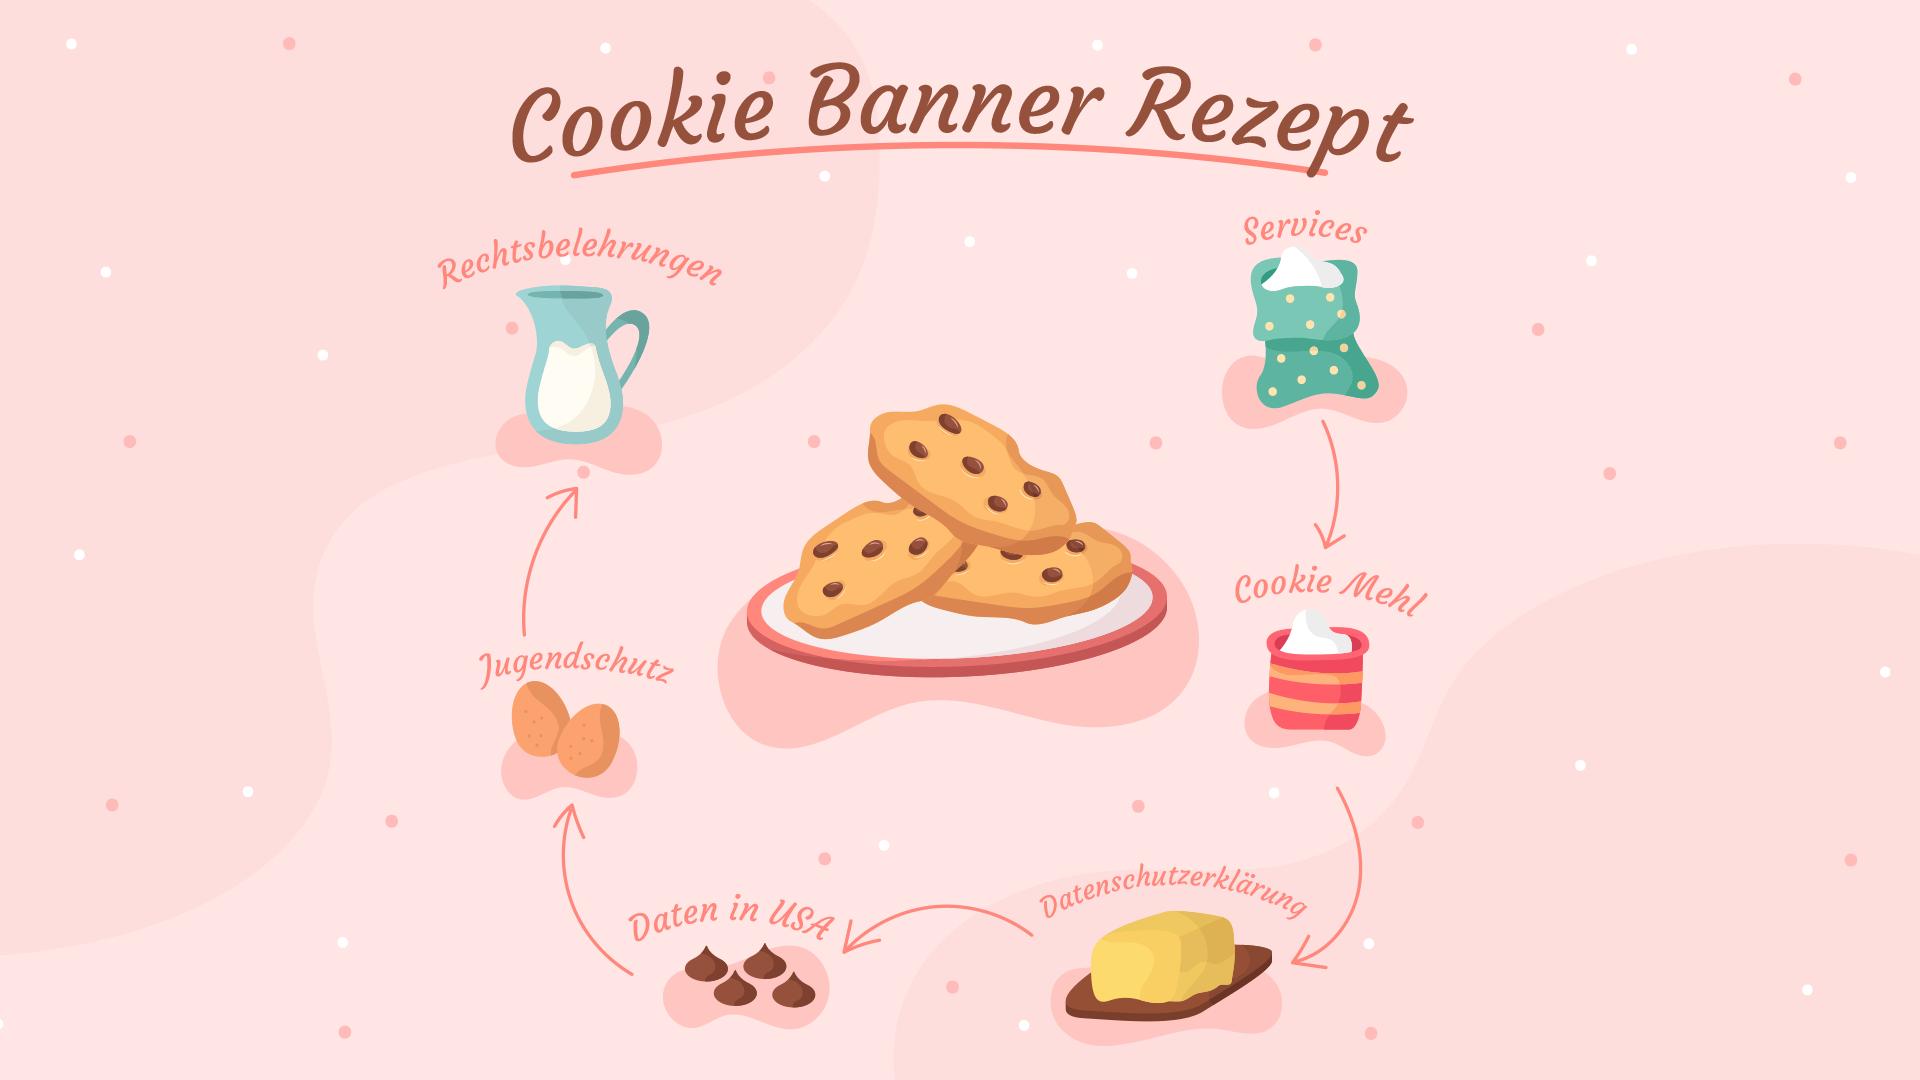 Cookie Banner Text Rezept